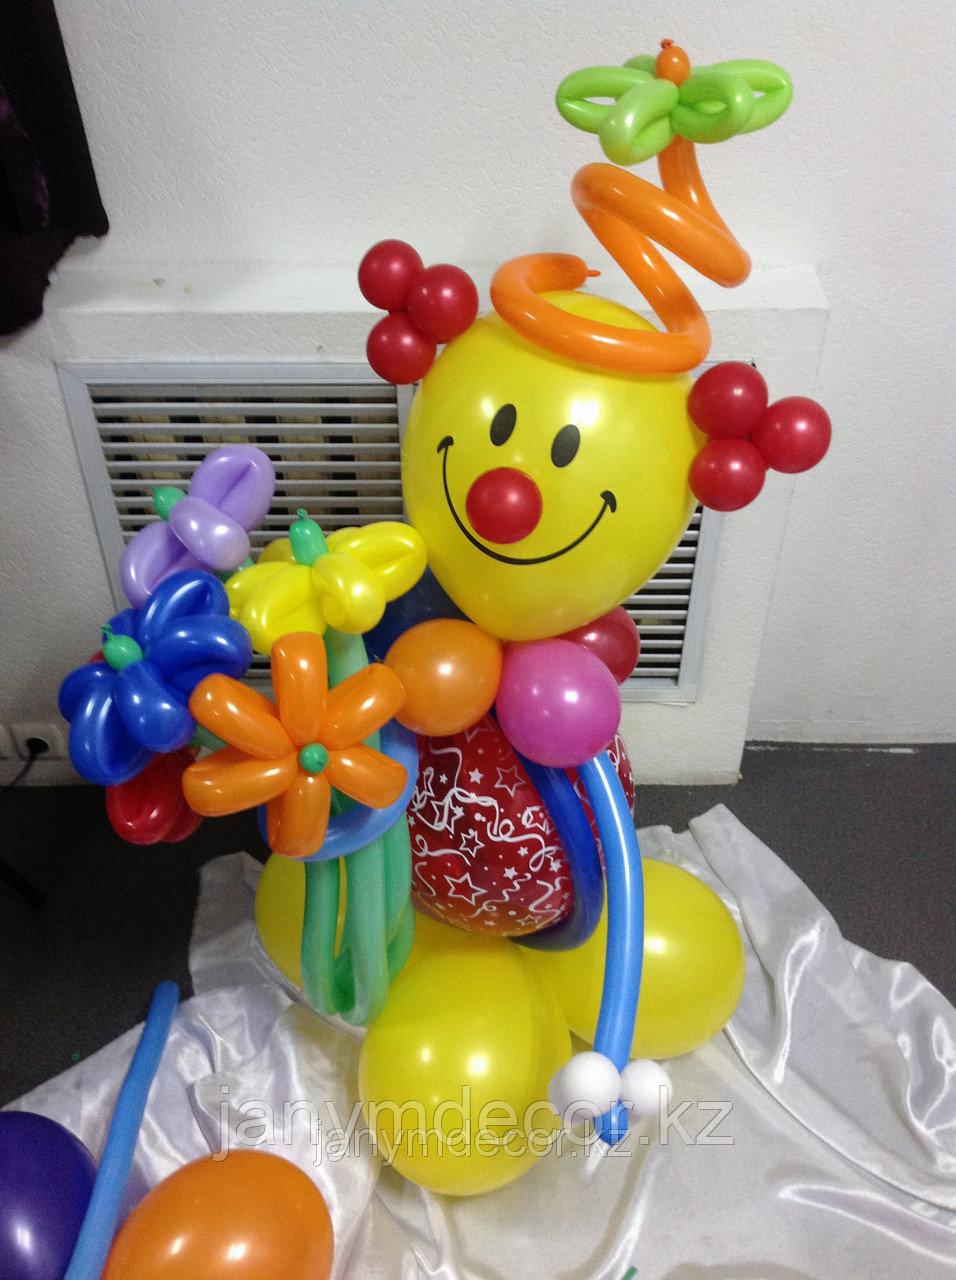 Клоун с букетом к 8 марта - фото 3